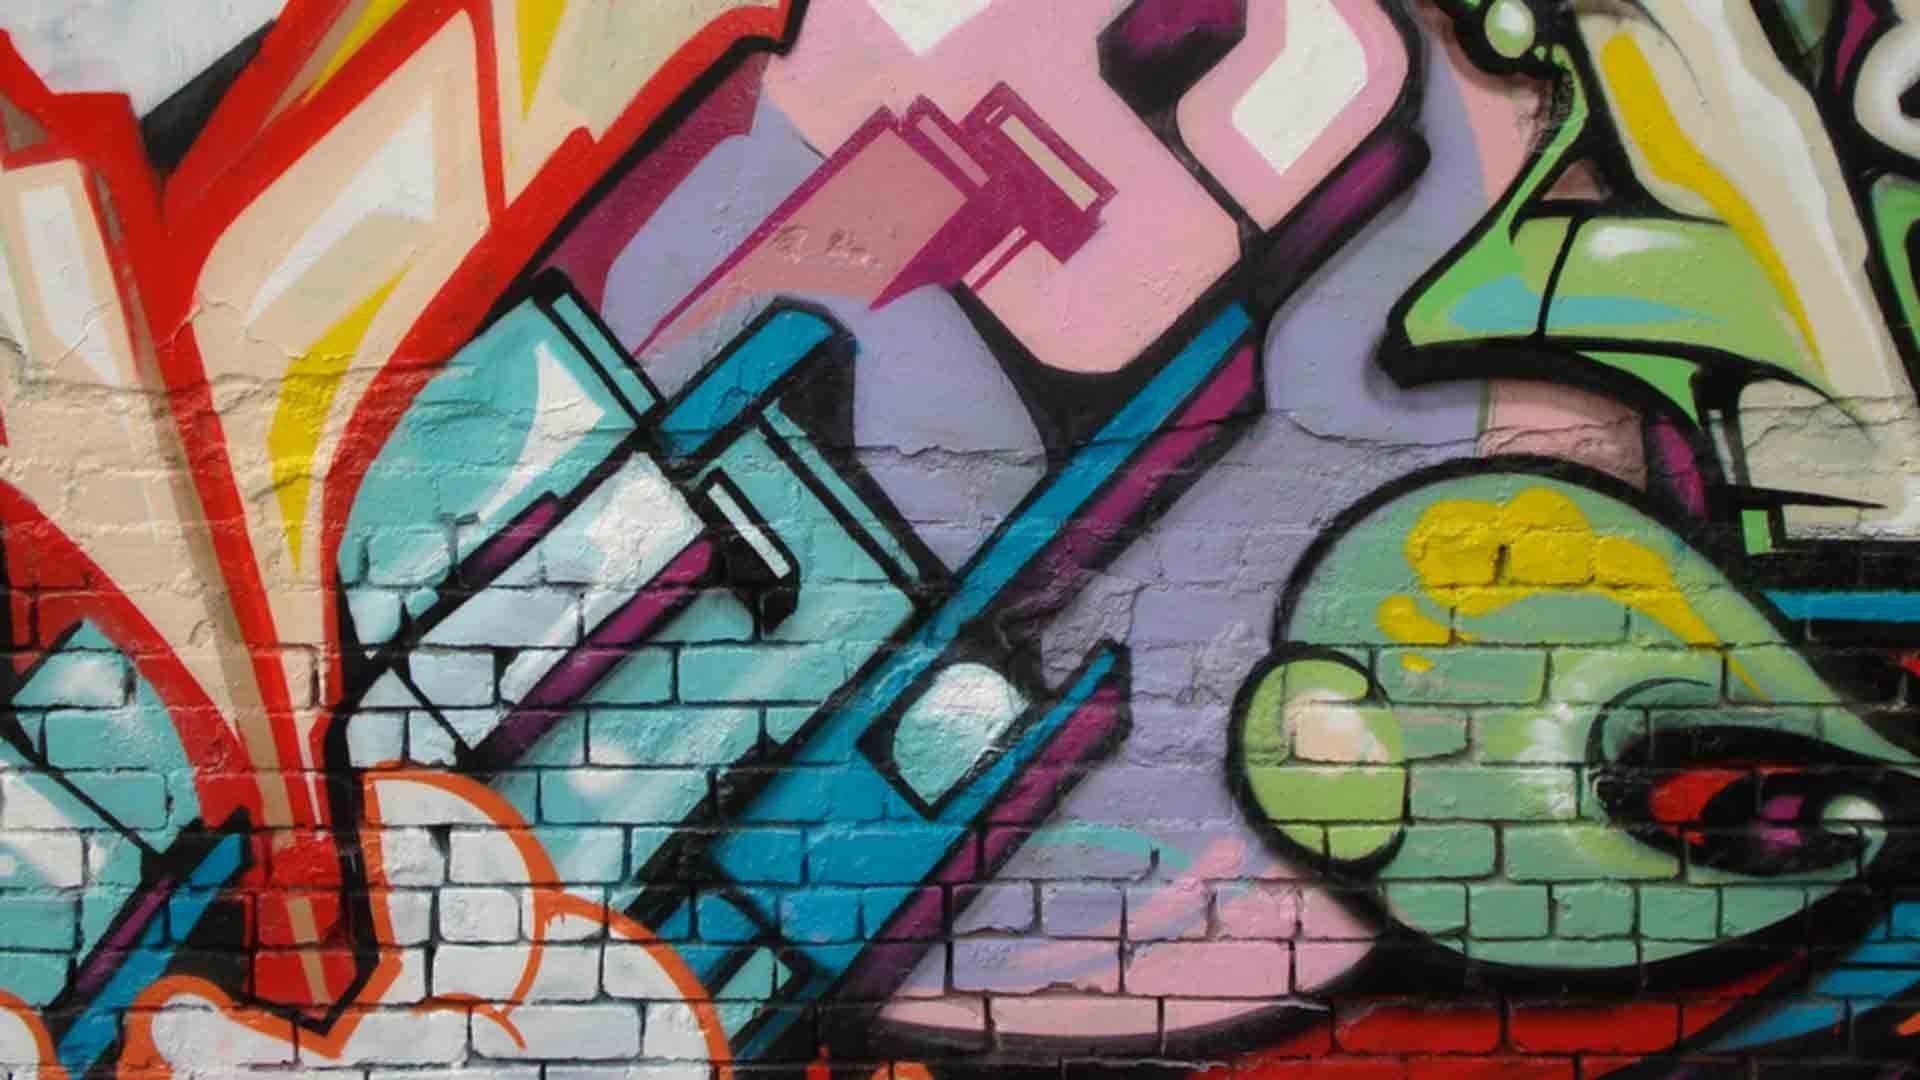 Graffiti Wallpapers Free